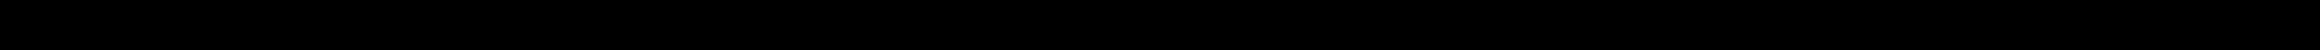 NGK 71 75 02 23, 71 75 02 23, 90048-51173, 90048-51173-000, 71 75 02 23 Zapaľovacia sviečka